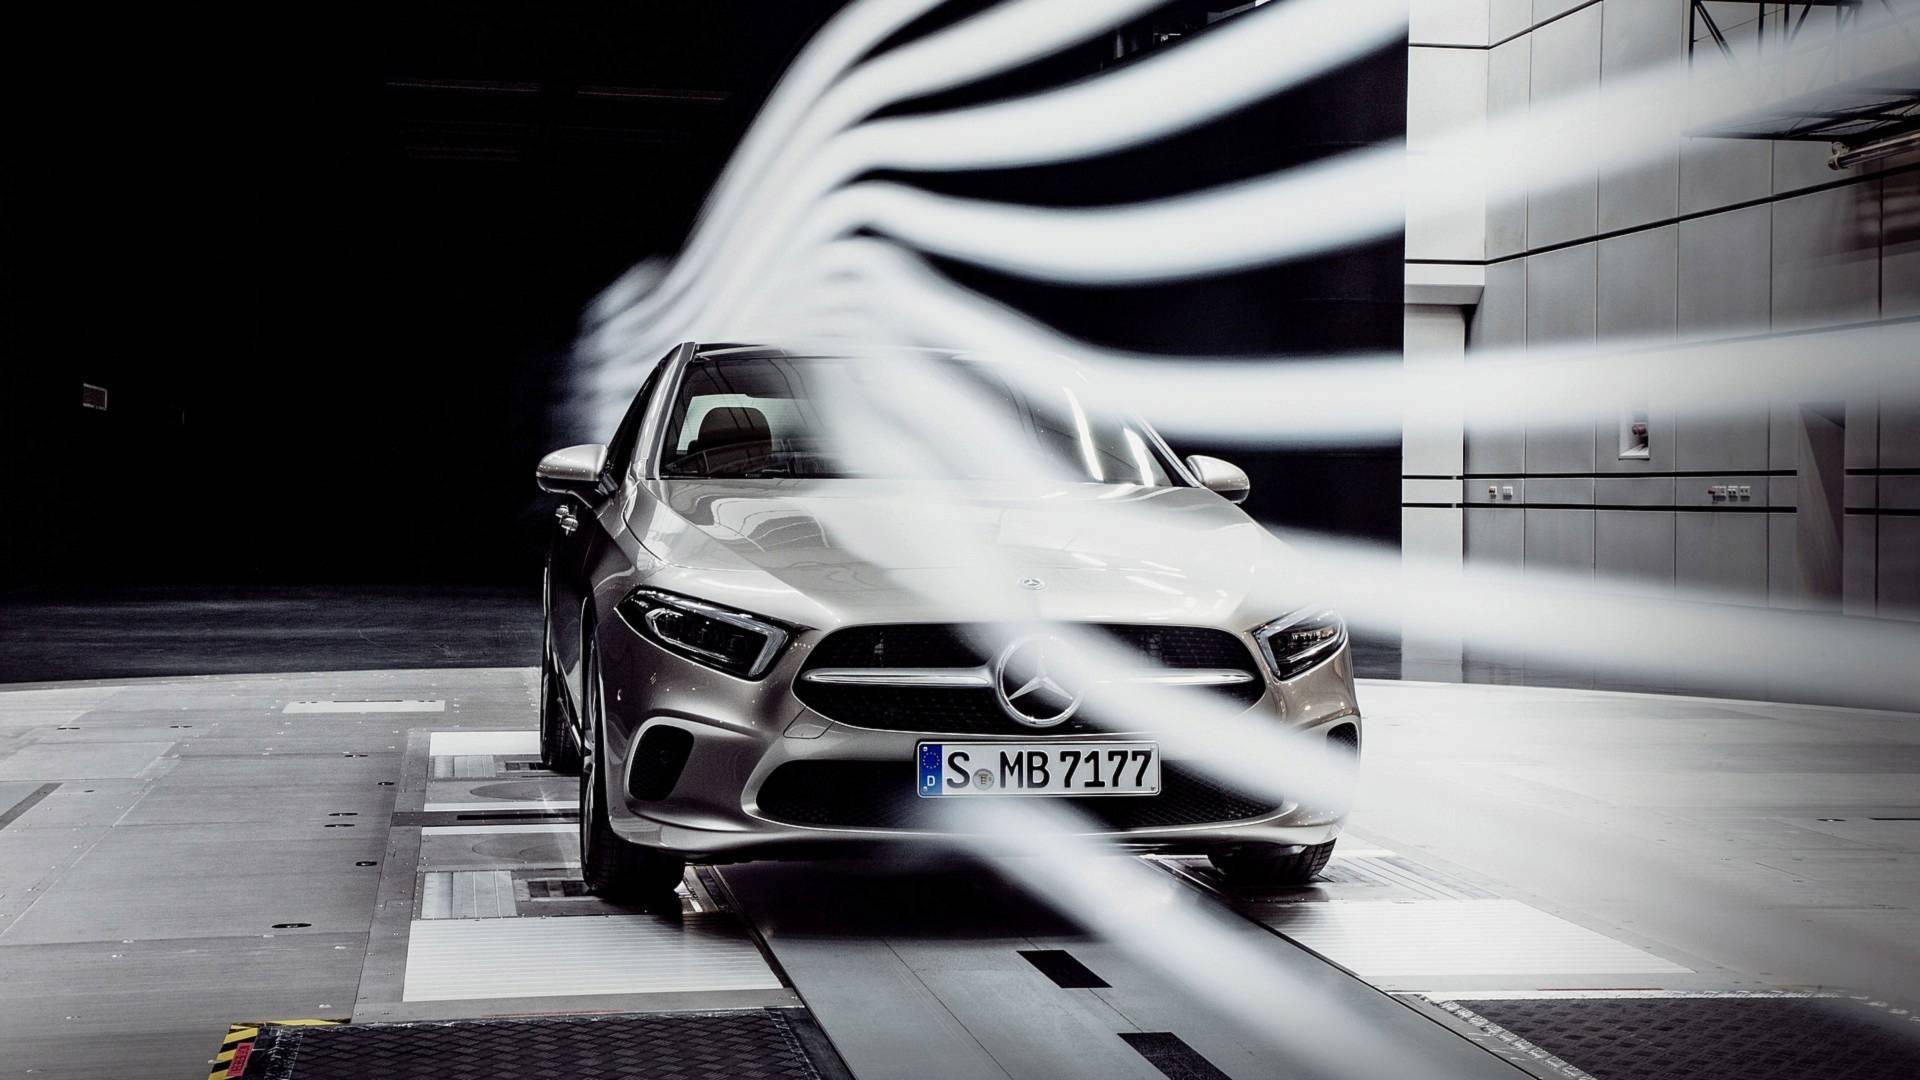 Mercedes benz a class sedan teased as the most aerodynamic for Mercedes benz worldwide